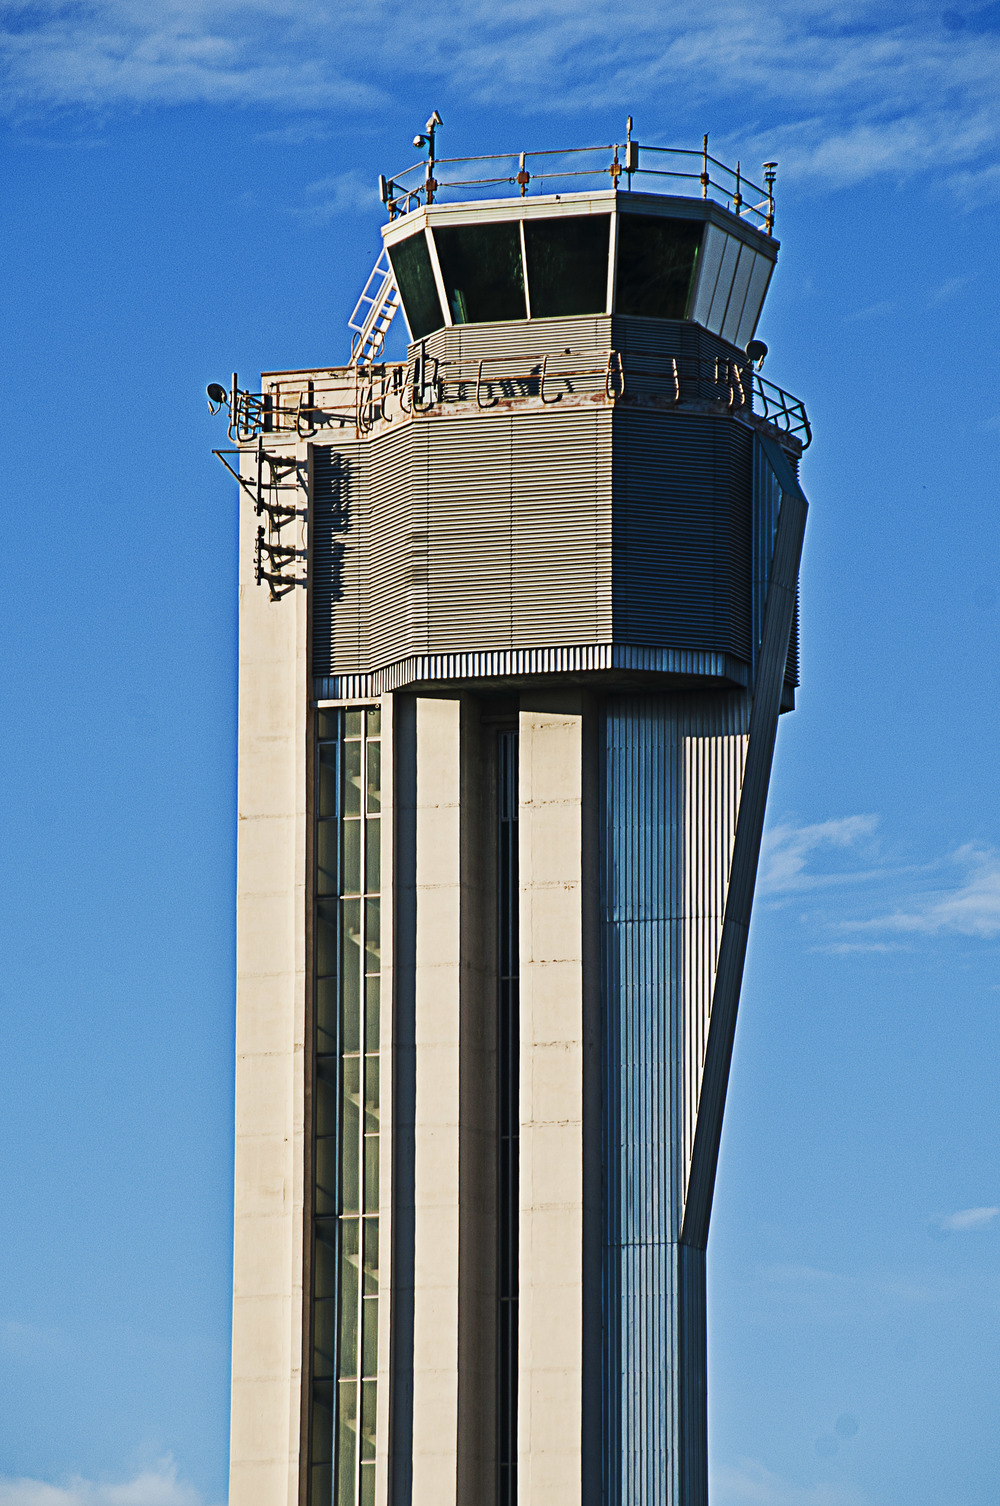 Stapleton Control Tower5284 (1) as Smart Object-1.jpg